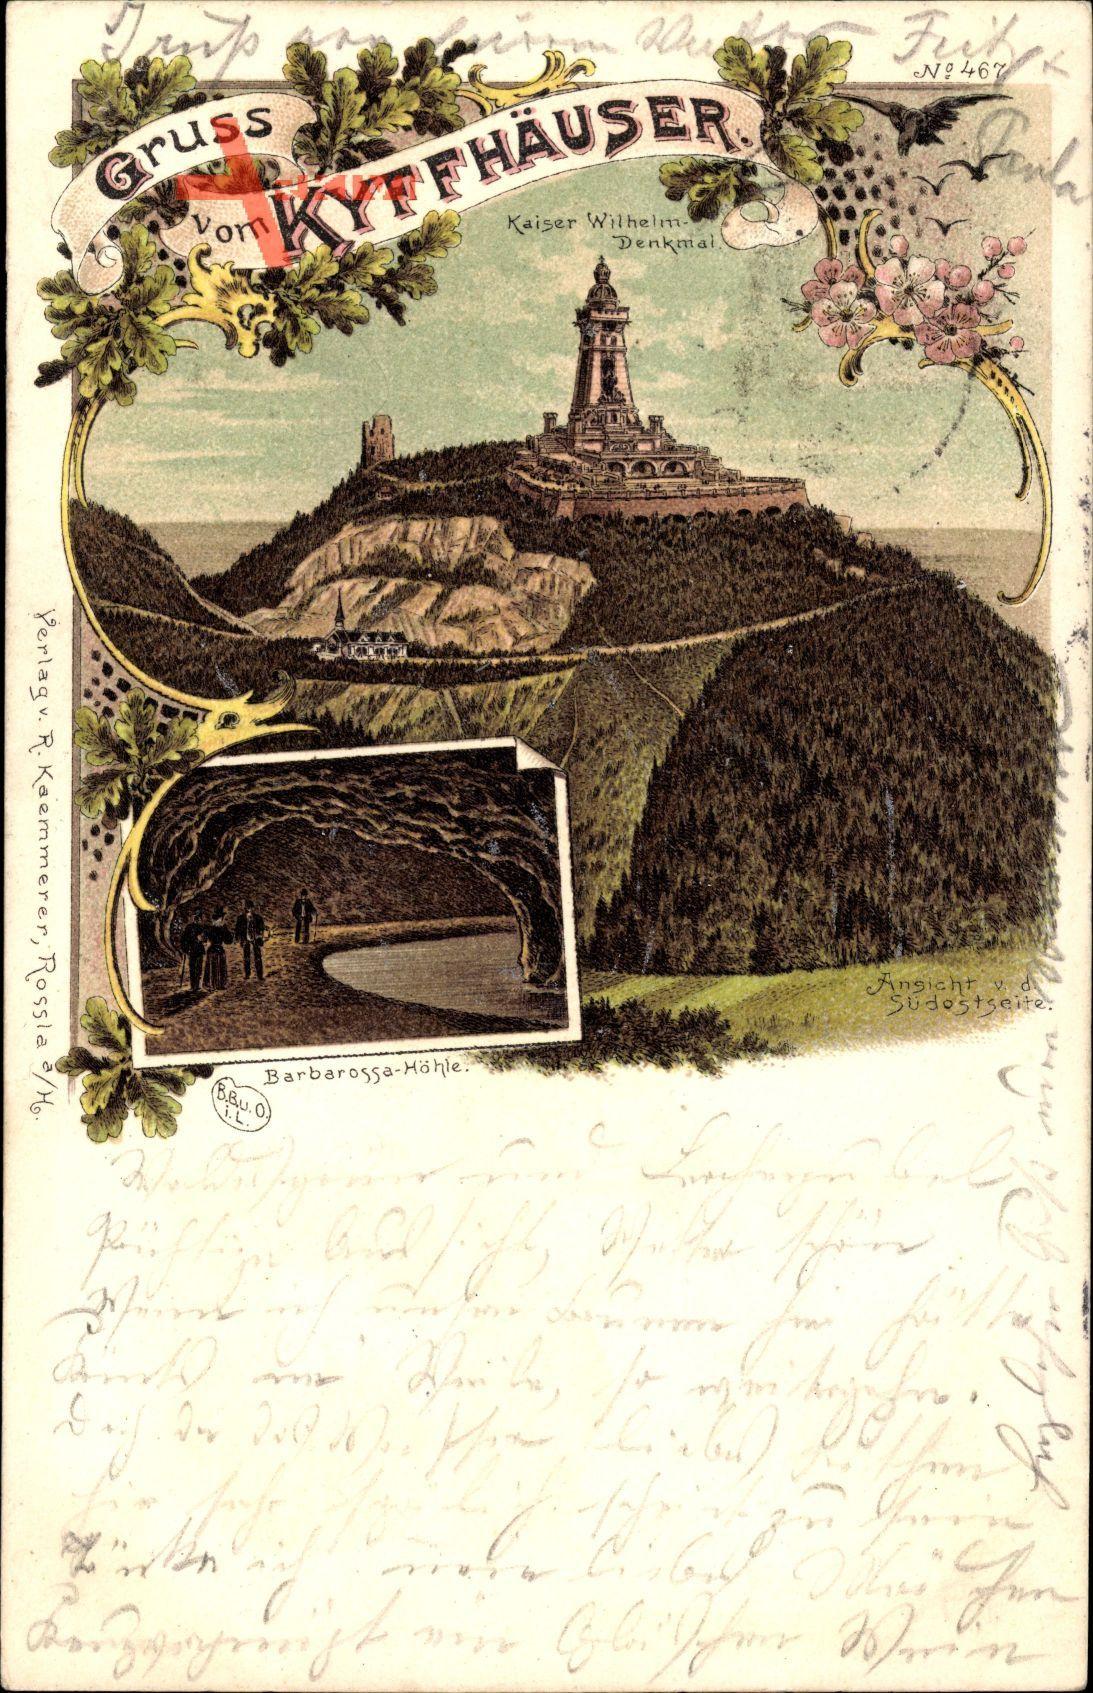 Kyffhäuserland in Thüringen, Barbarossa Höhle, Kaiser Wilhelm Denkmal